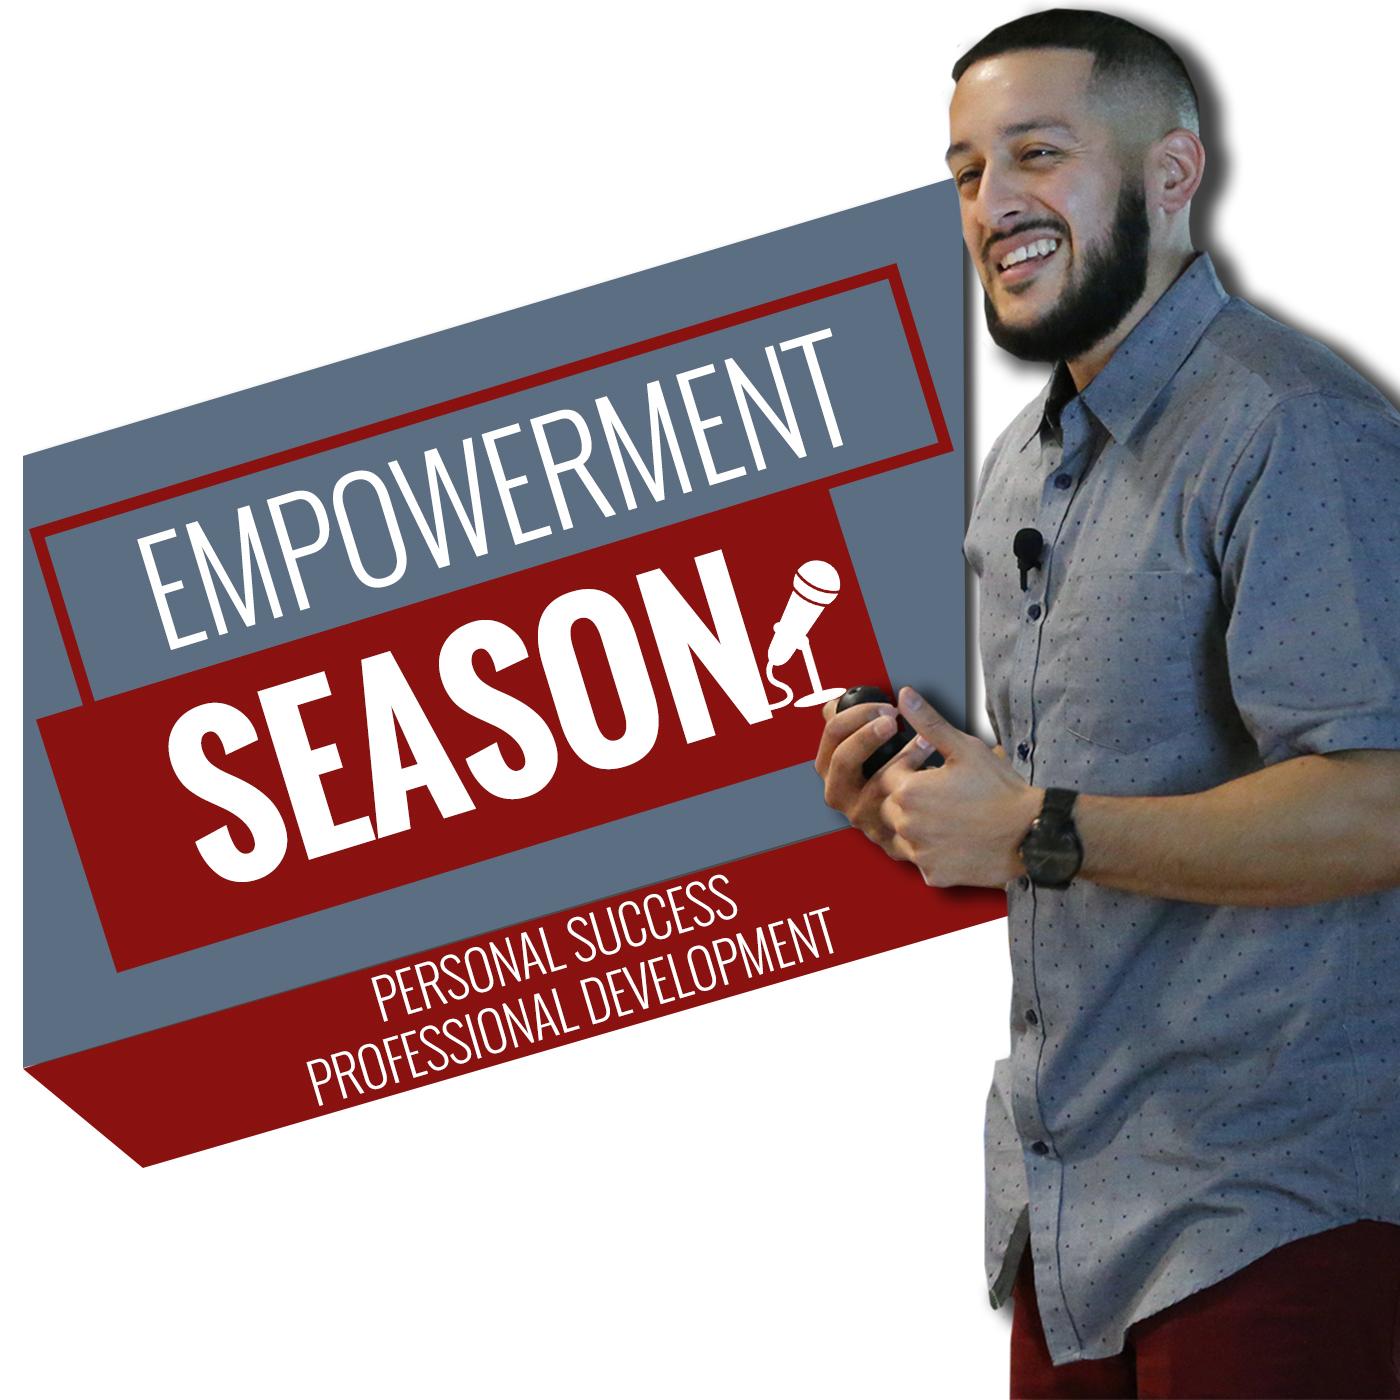 Empowerment Season | Personal Success | Professional Development | Motivation